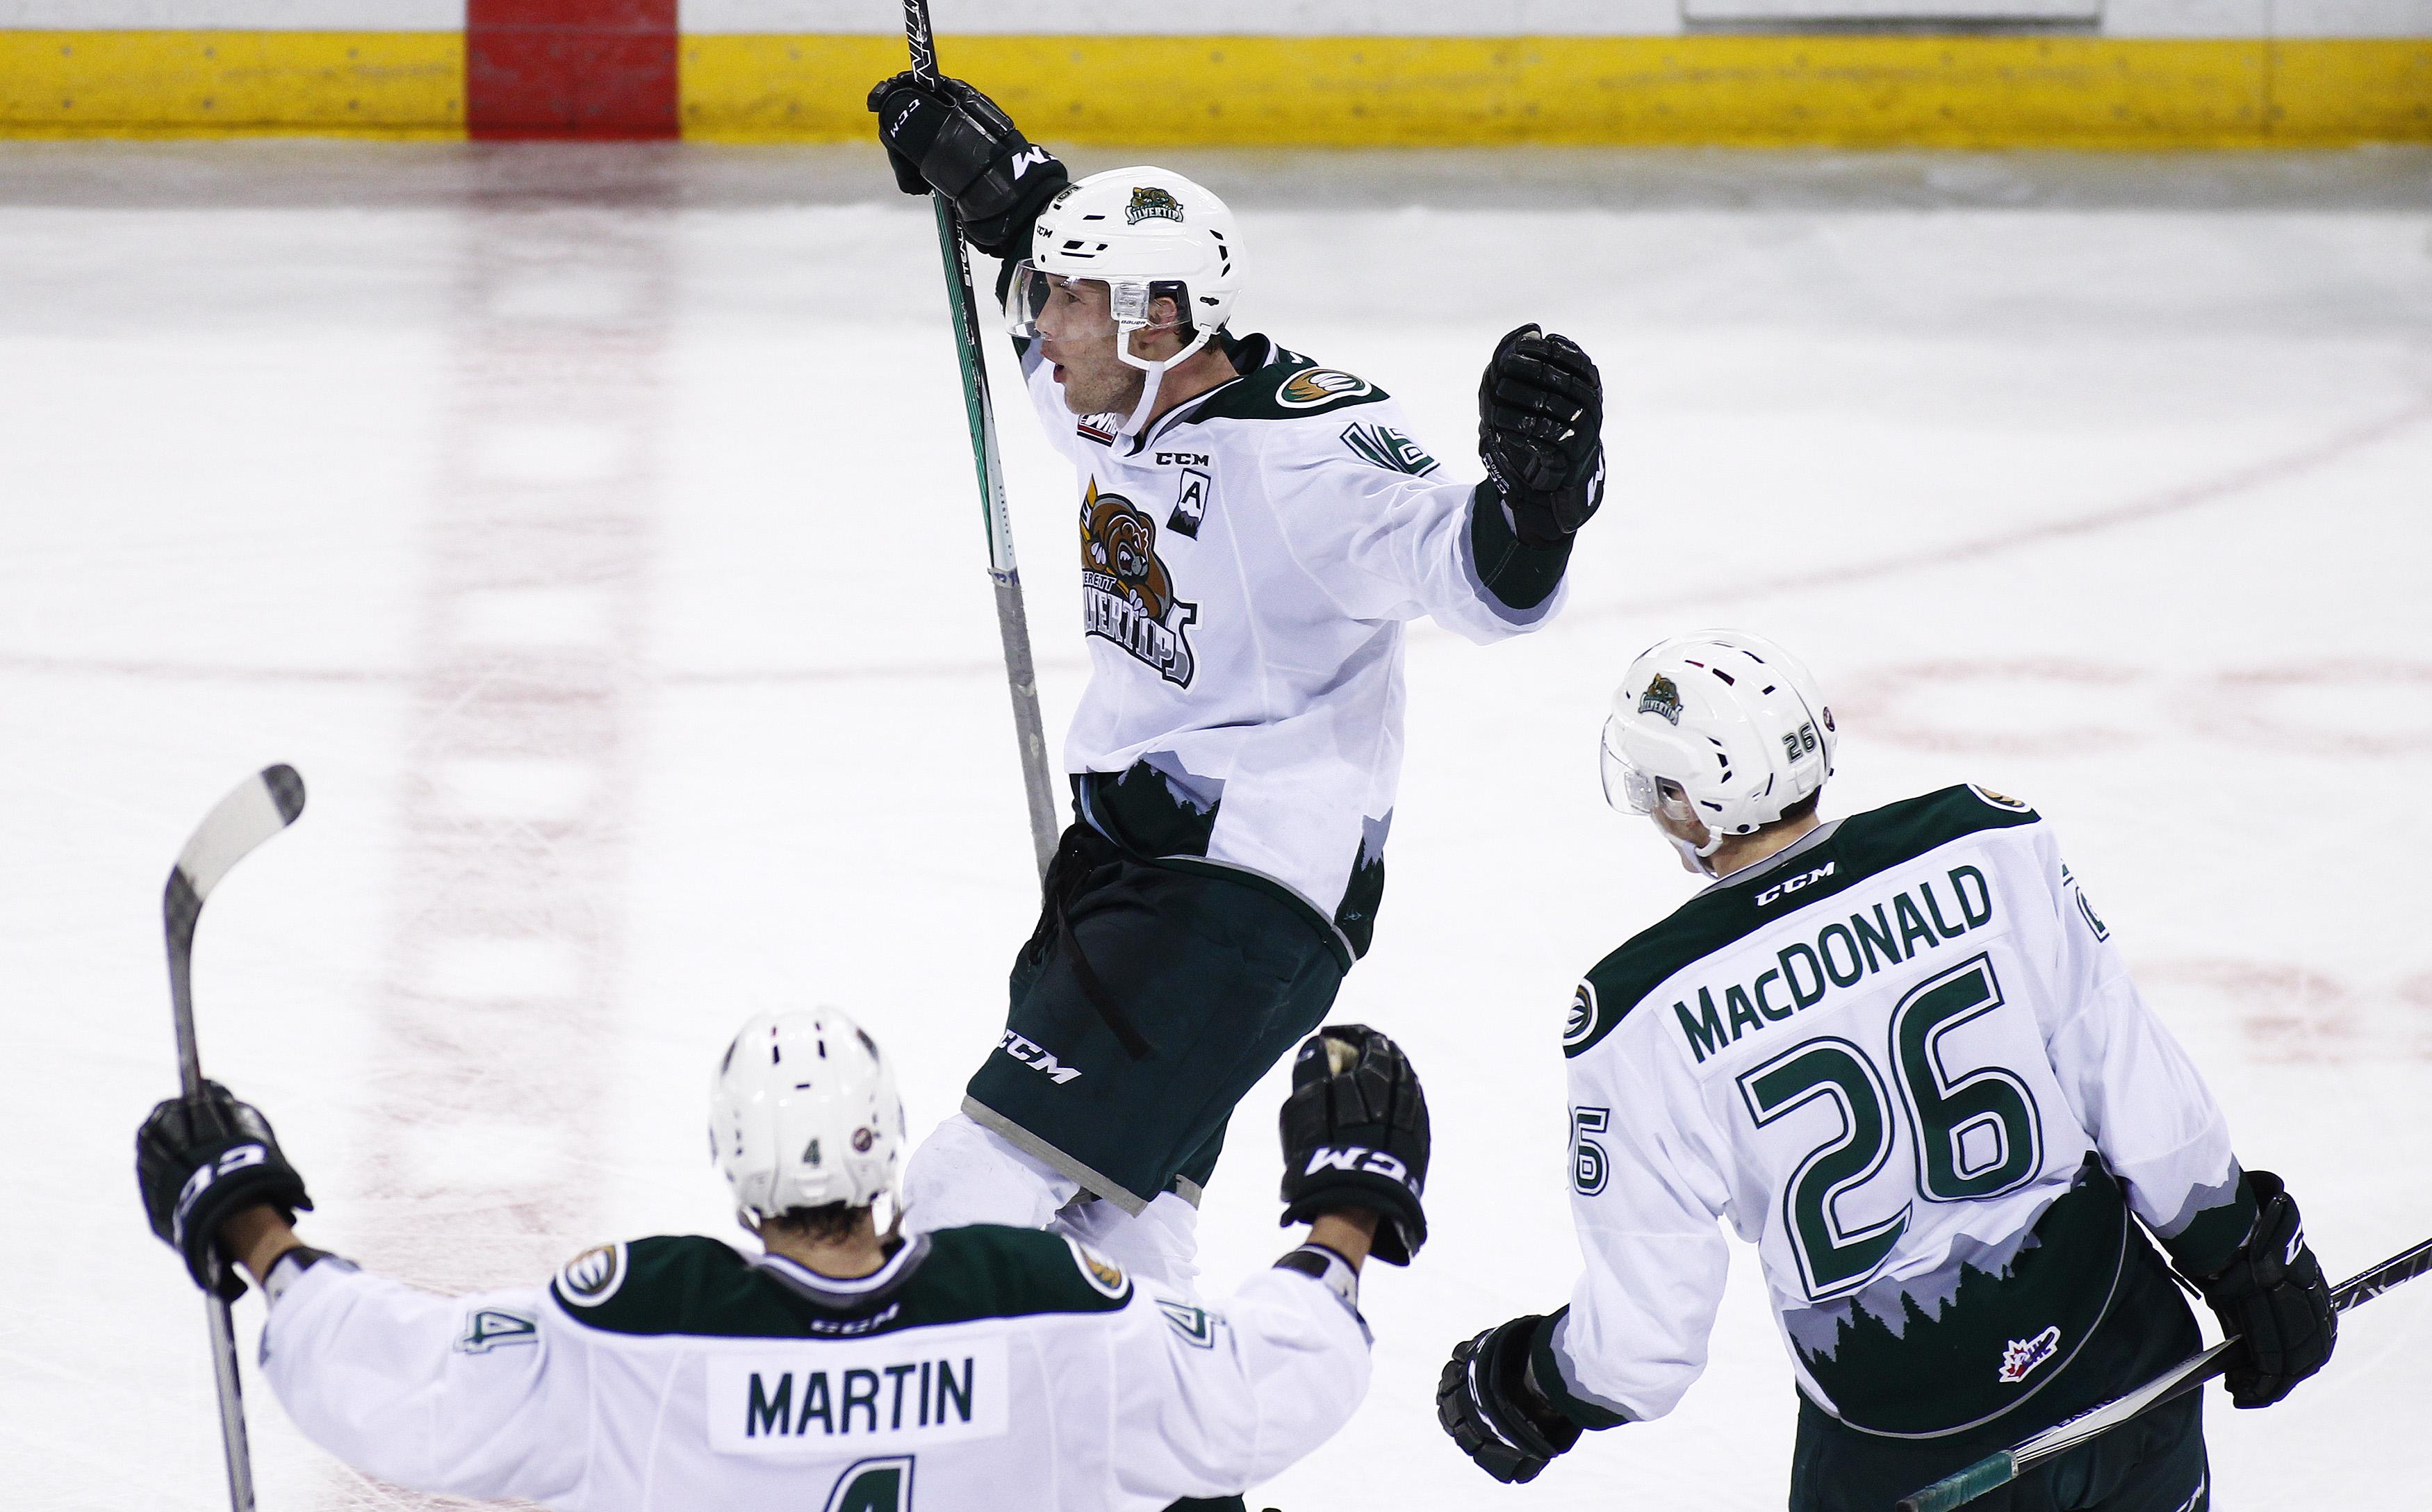 Carson Stadnyk celebrating a goal